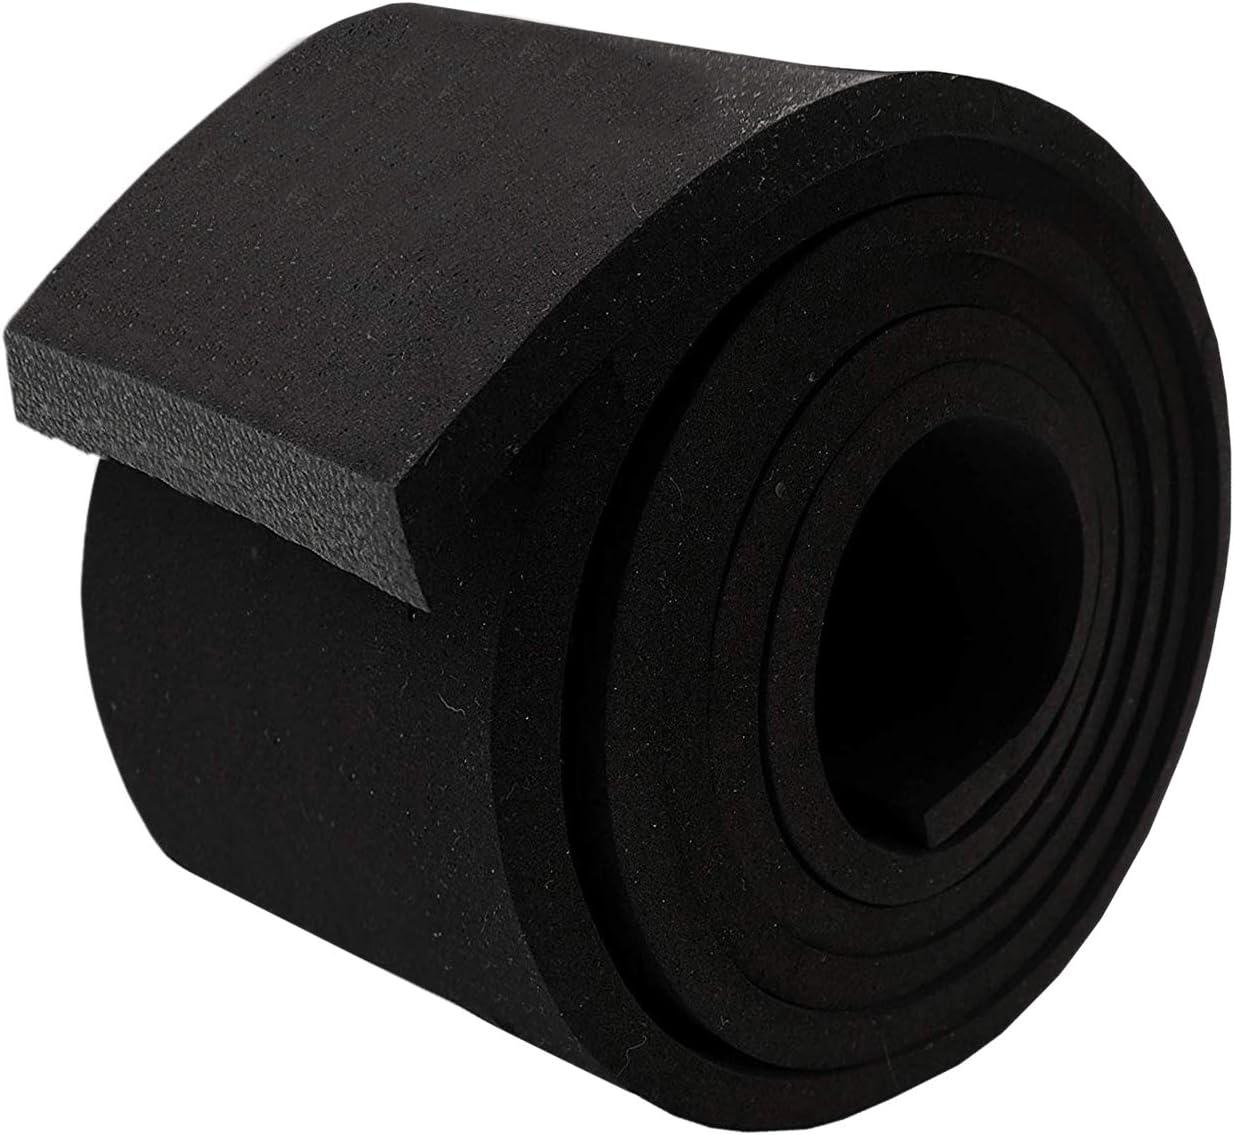 "Neoprene Foam Strip Roll by Dualplex, 3"" Wide x 10' Long x 1/4"" Thick, Weather Seal High Density Stripping – Weather Strip Roll Insulation Foam Strips - 10 Feet Long"